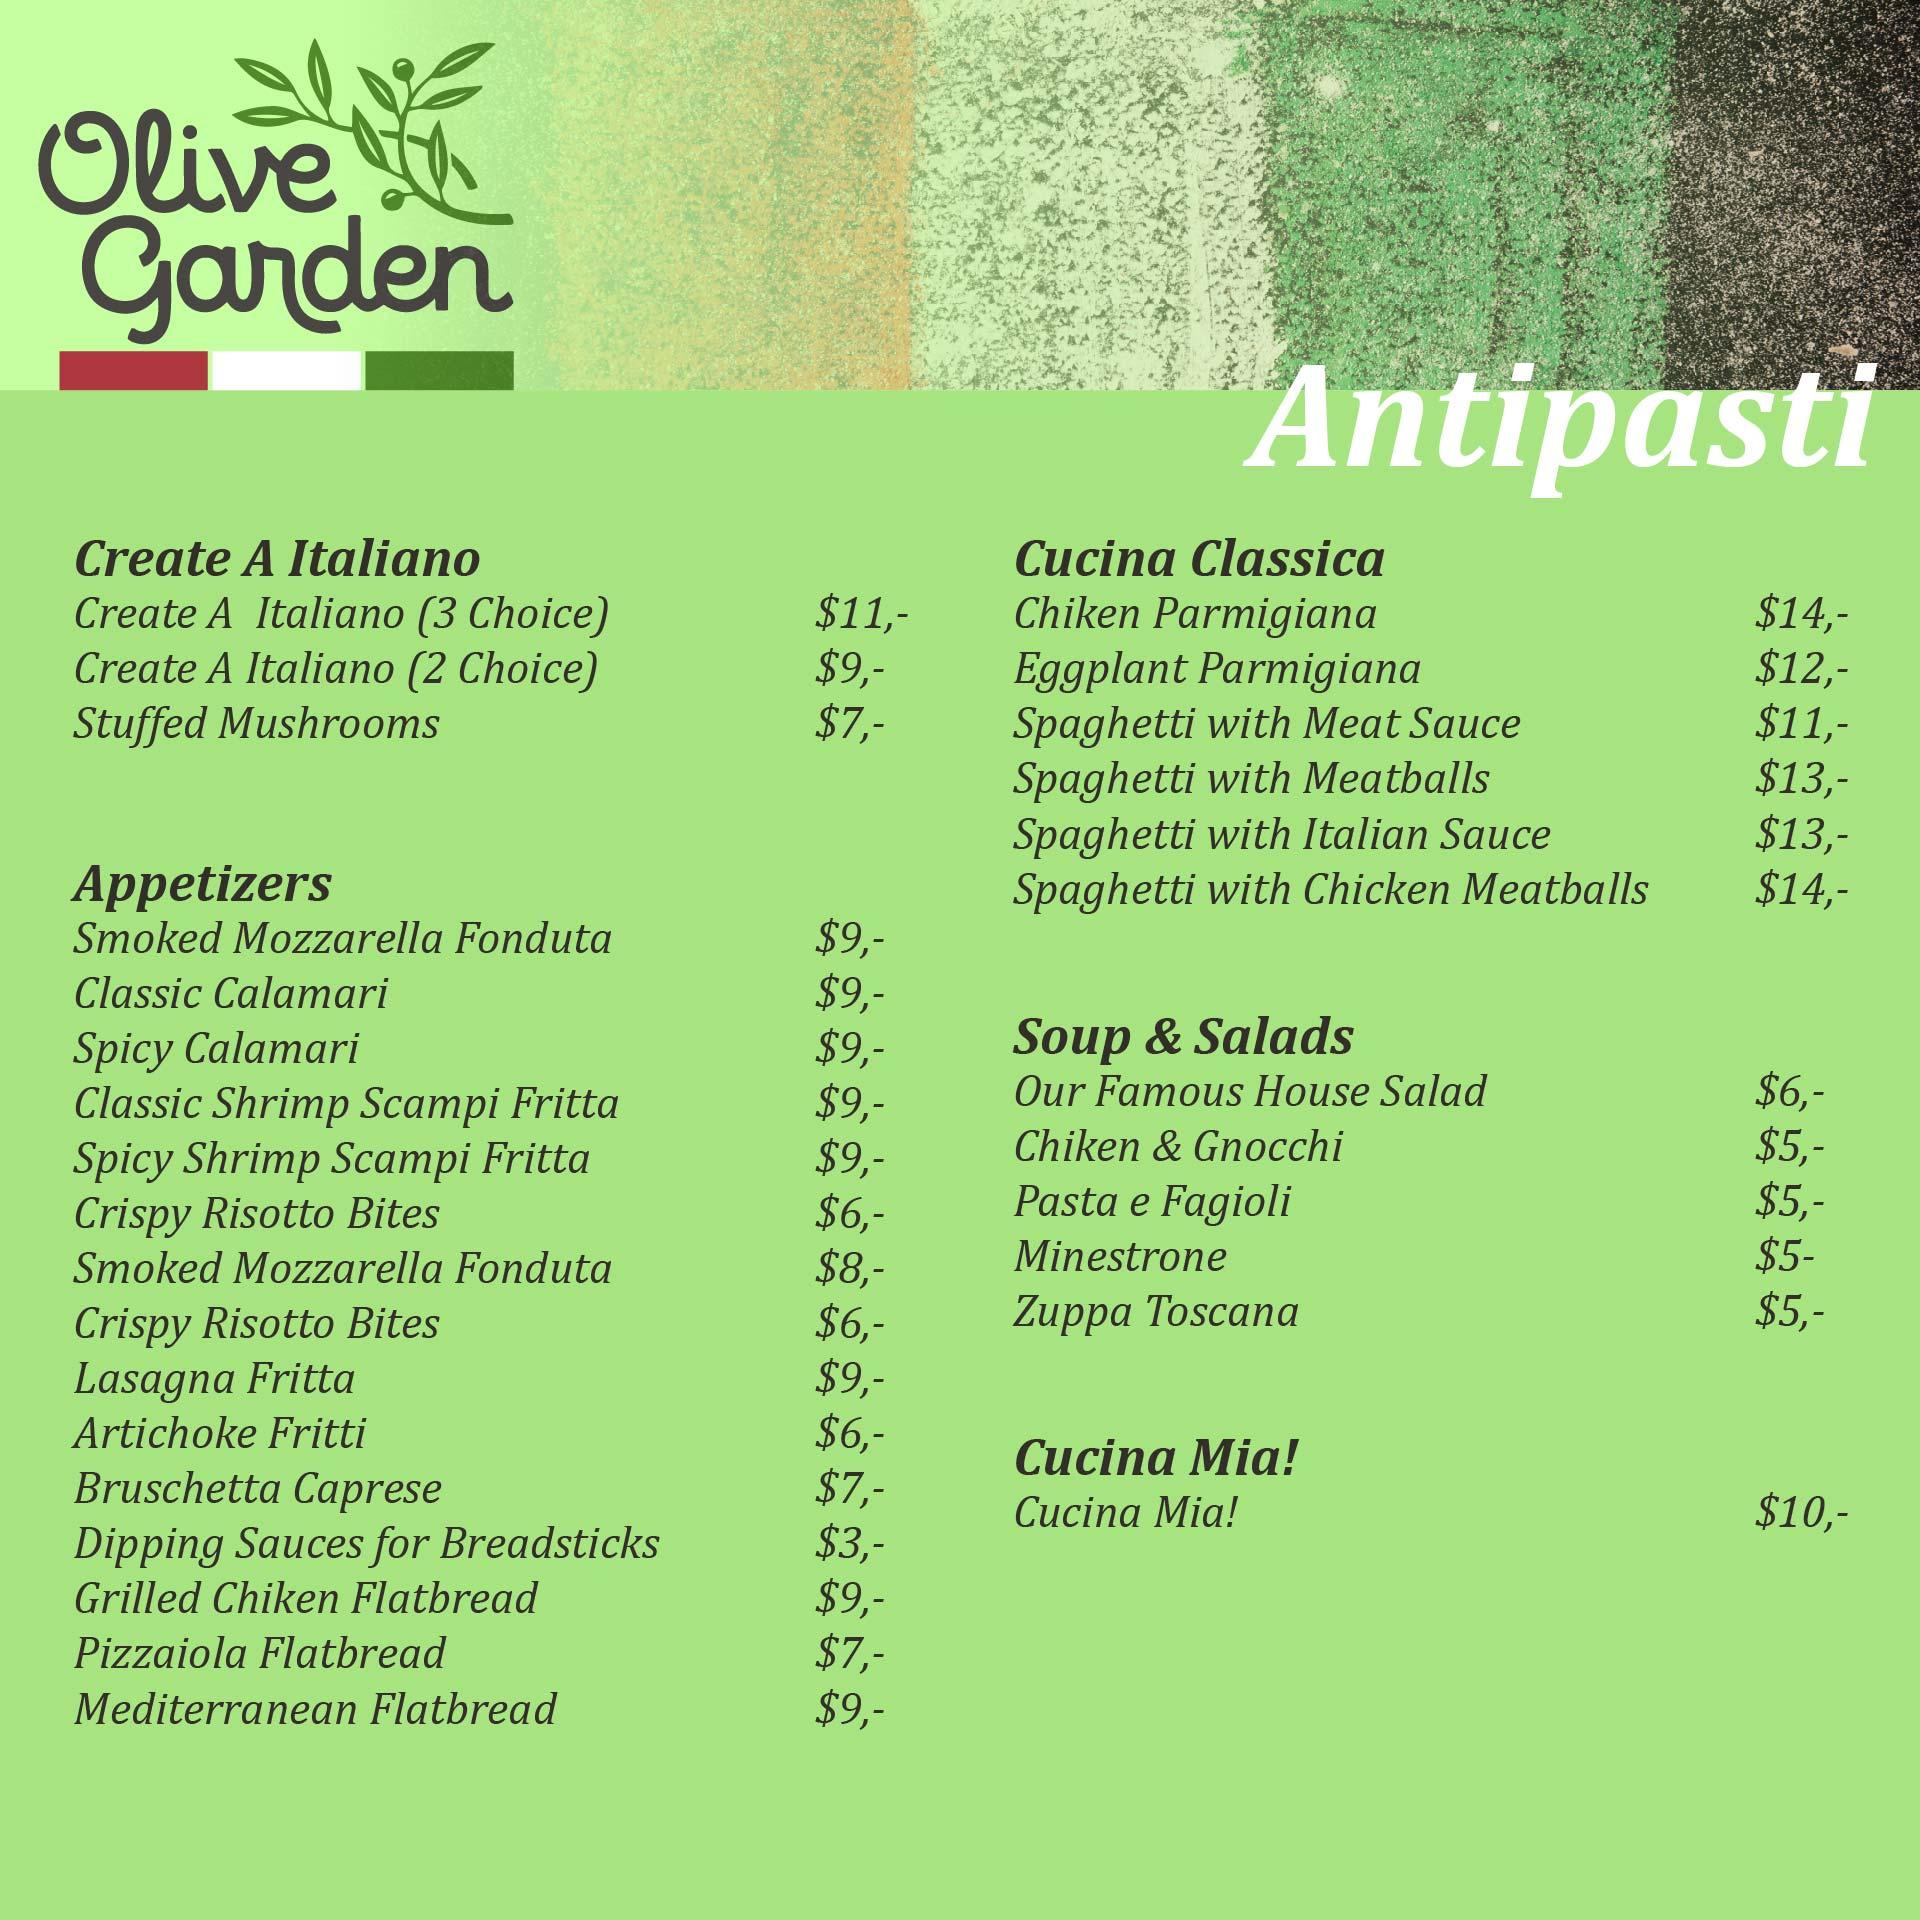 7 Best Images Of Olive Garden Menu Printable Out Olive Garden Menu Olive Garden Menu Recipes